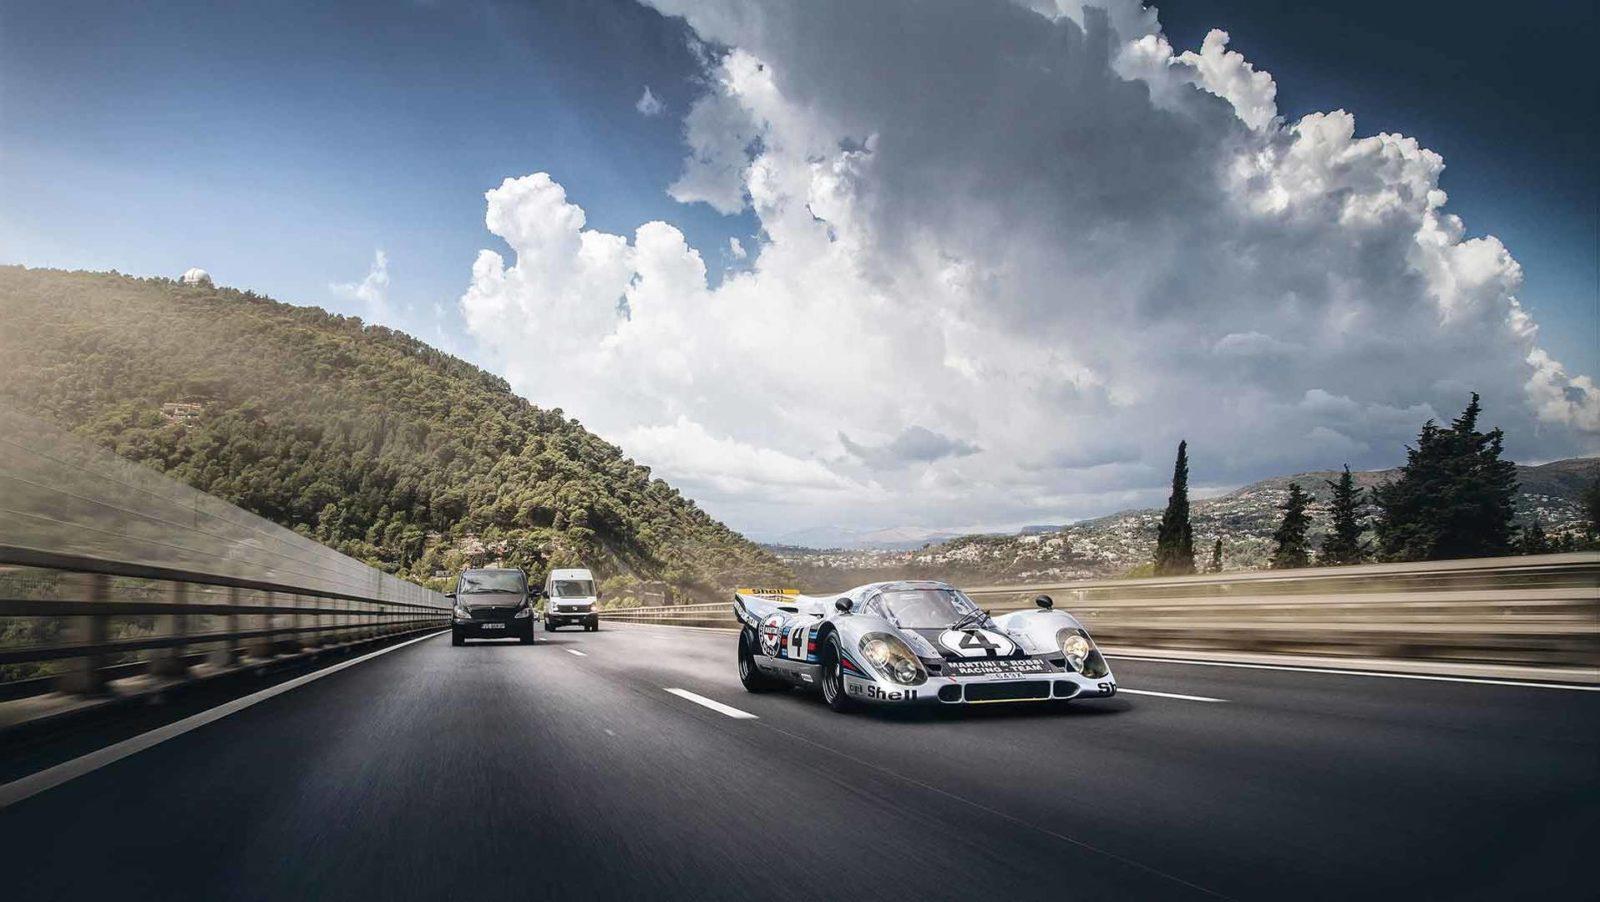 Street legal road Porsche 917 monaco